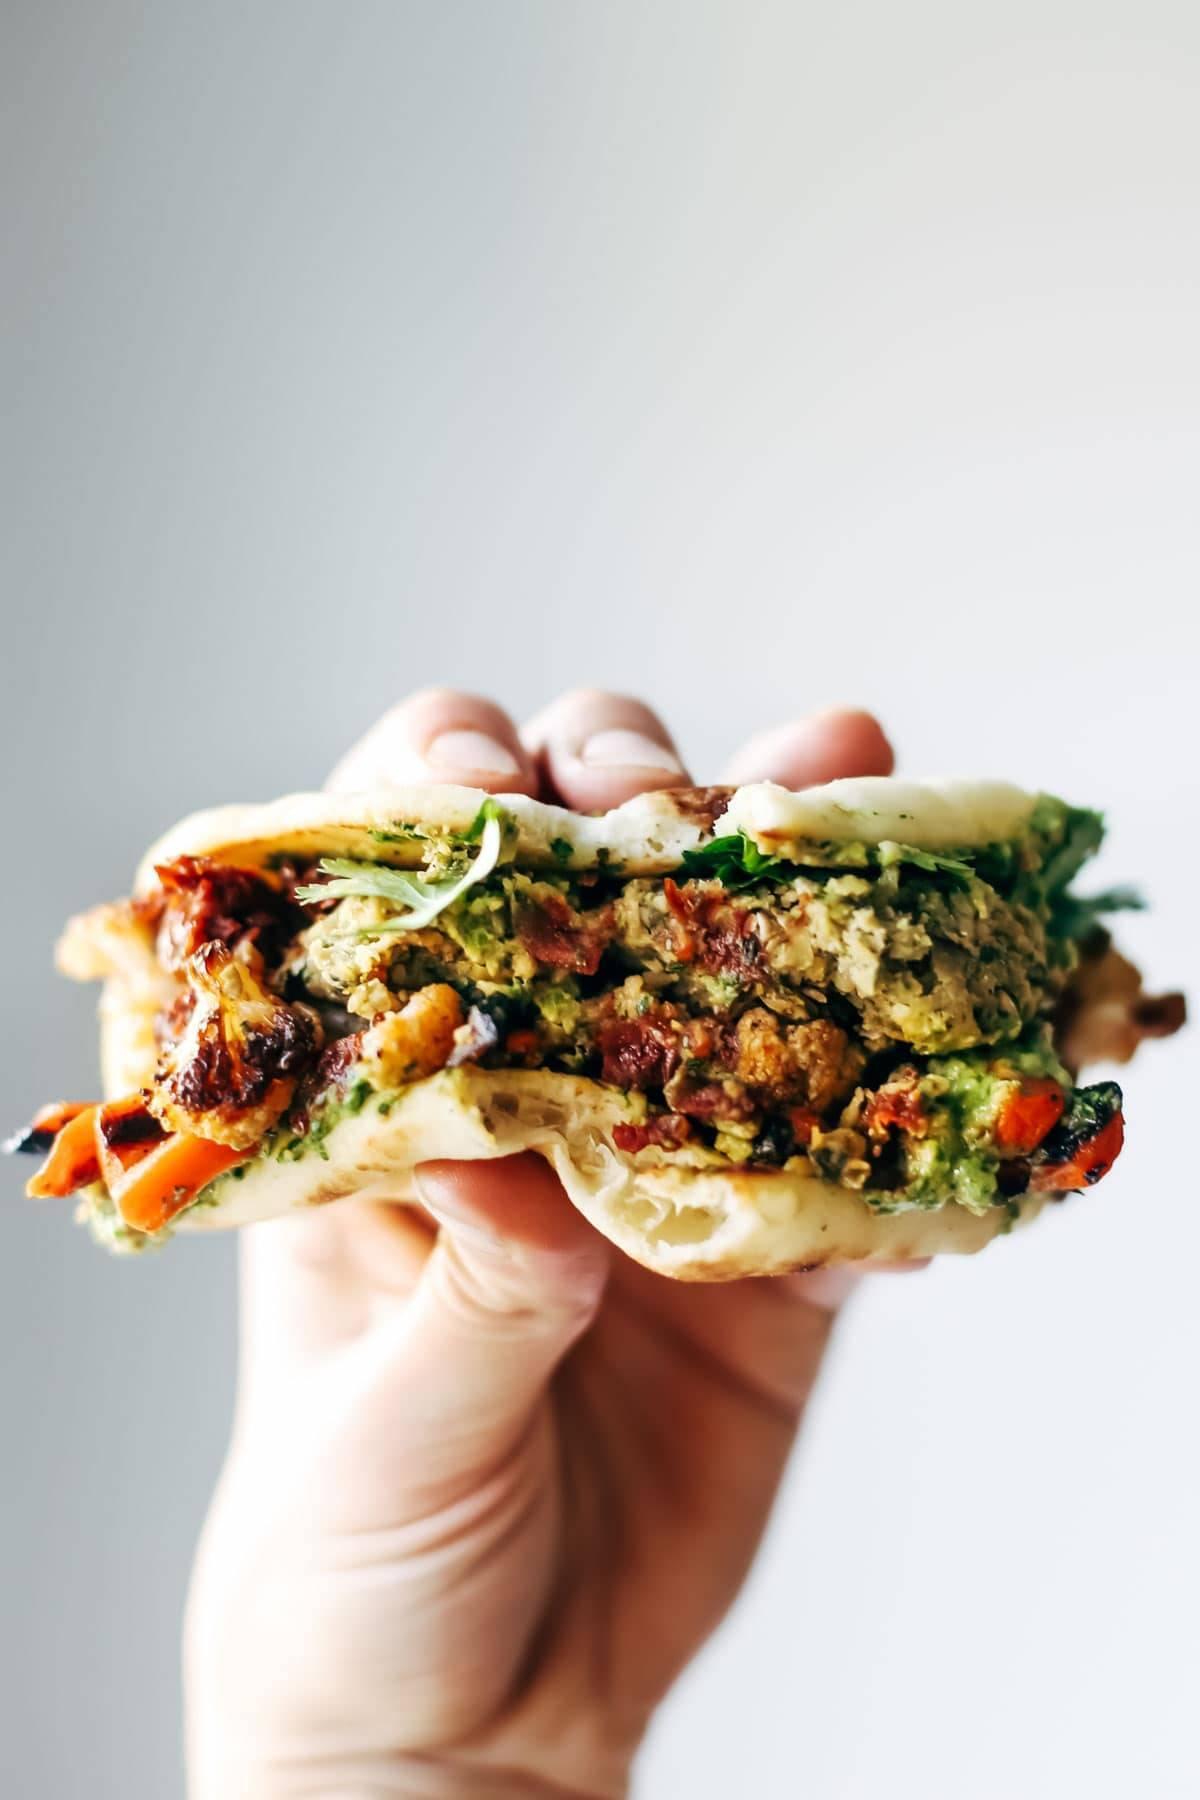 Falafel, roasted veggies, and avocado sauce stuffed between garlic naan.